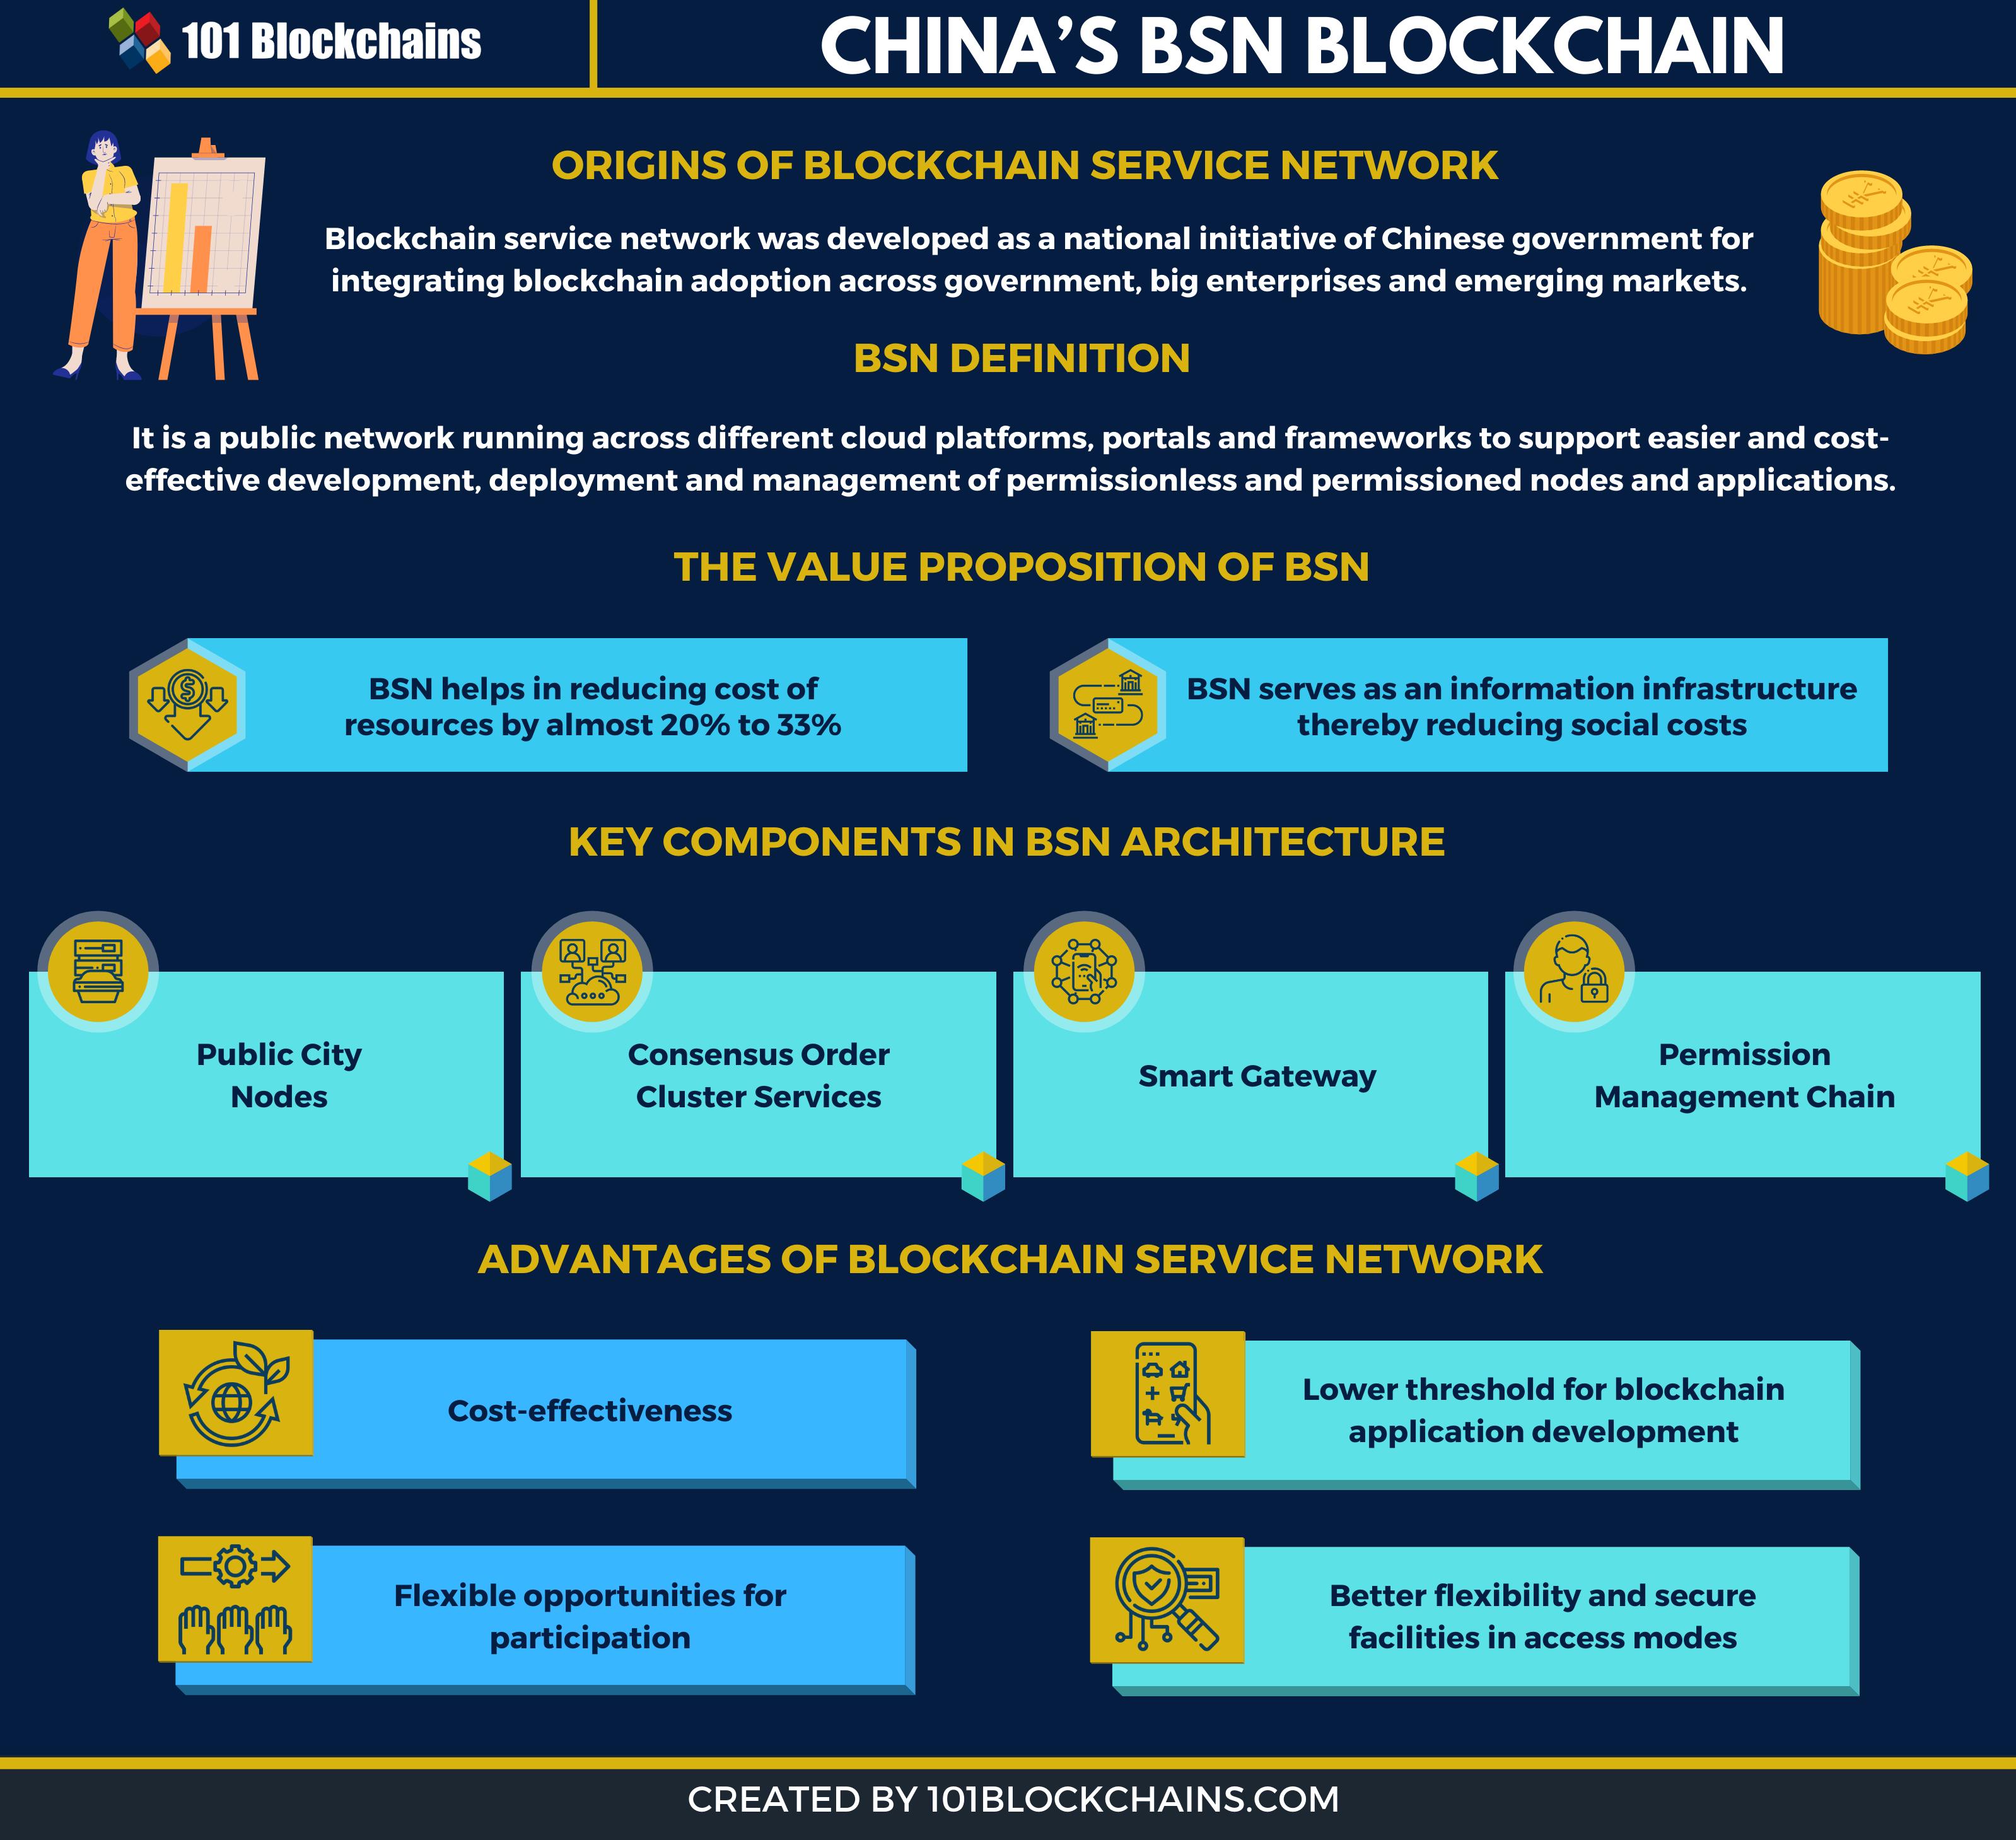 bsn blockchain infographic